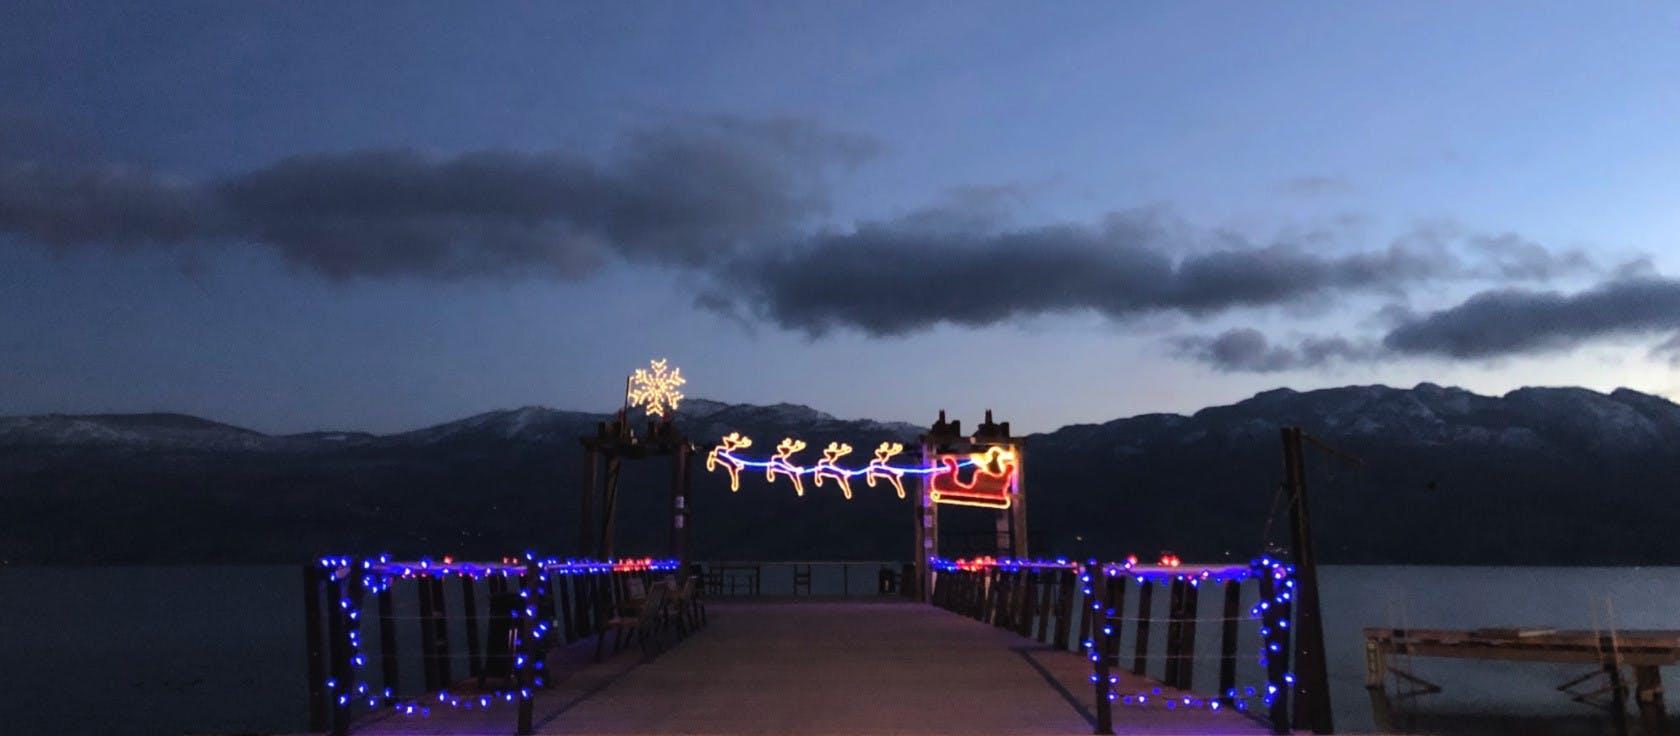 cnr wharf lights.jpg